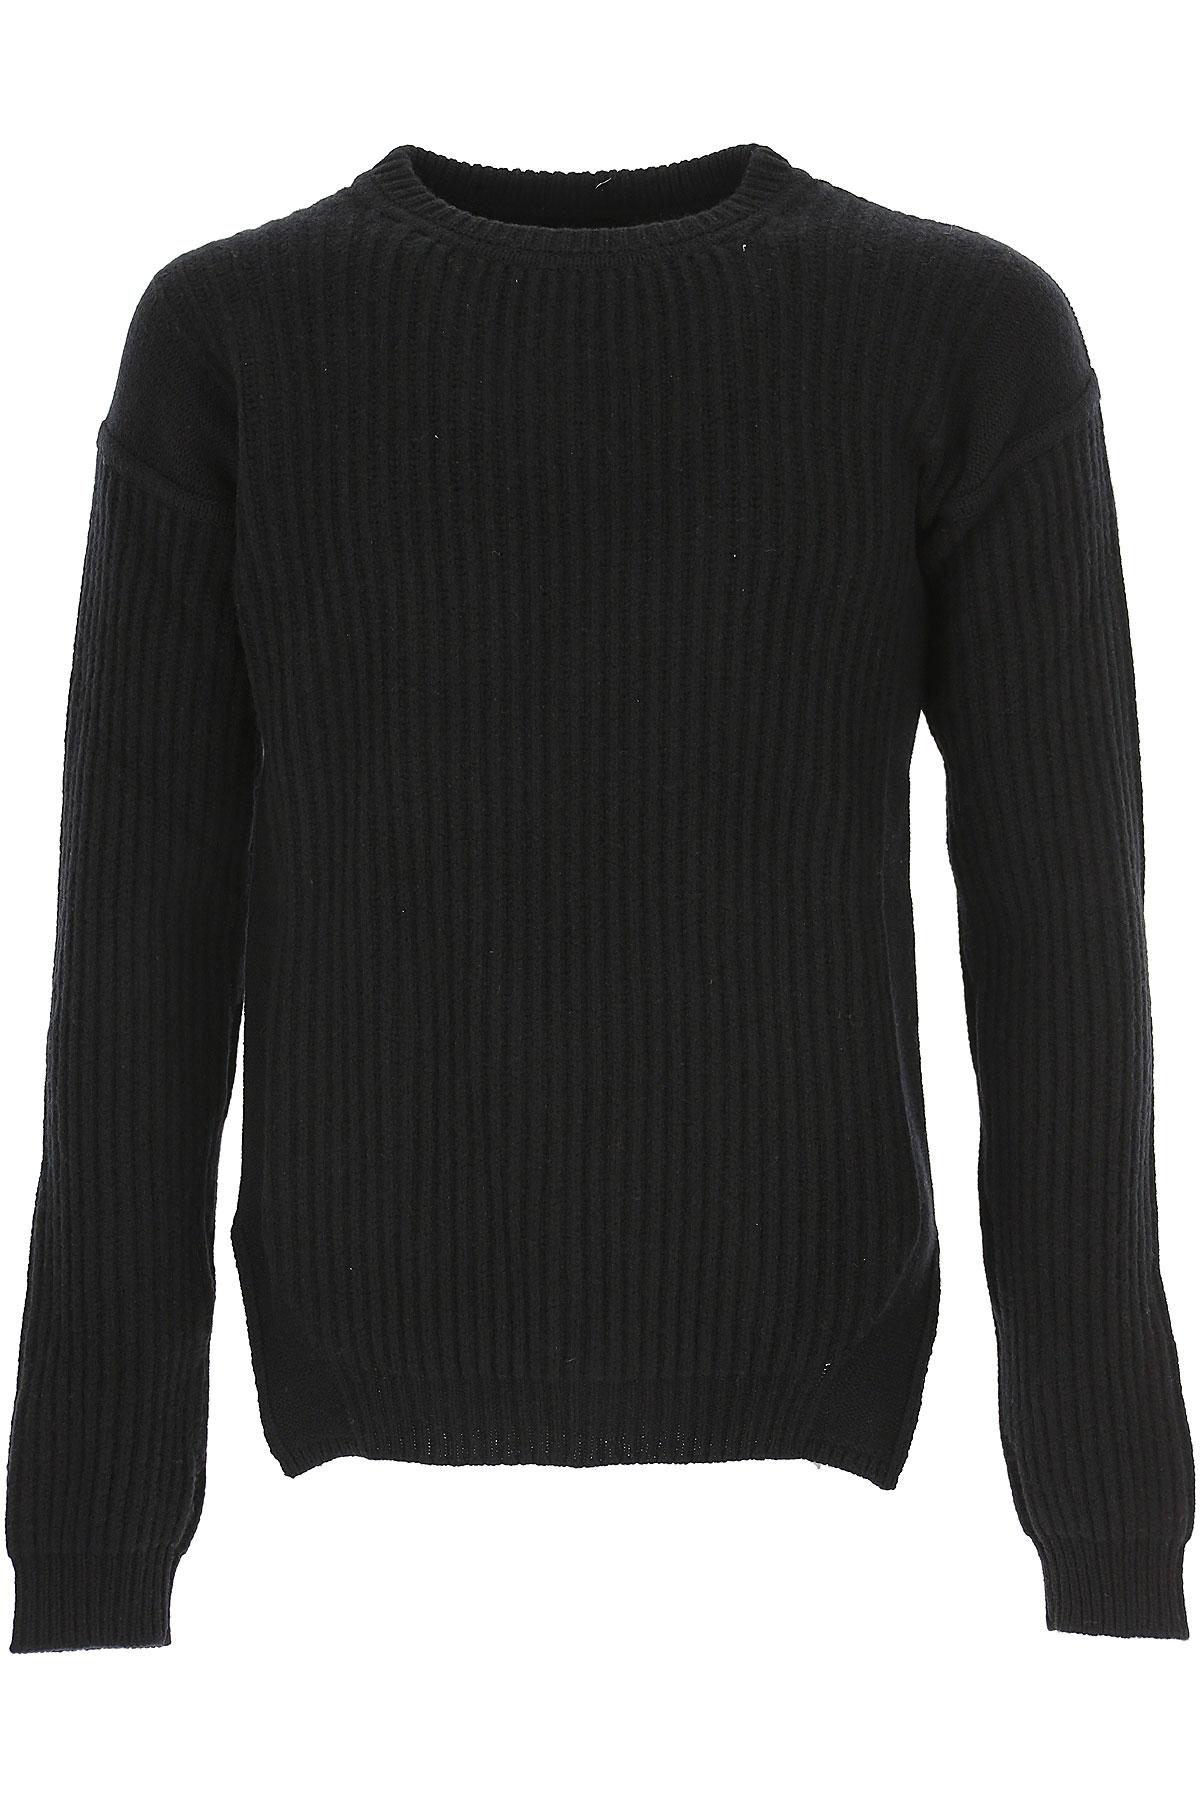 Rick Owens Sweater for Men Jumper On Sale in Outlet, Black, Wool, 2019, M S